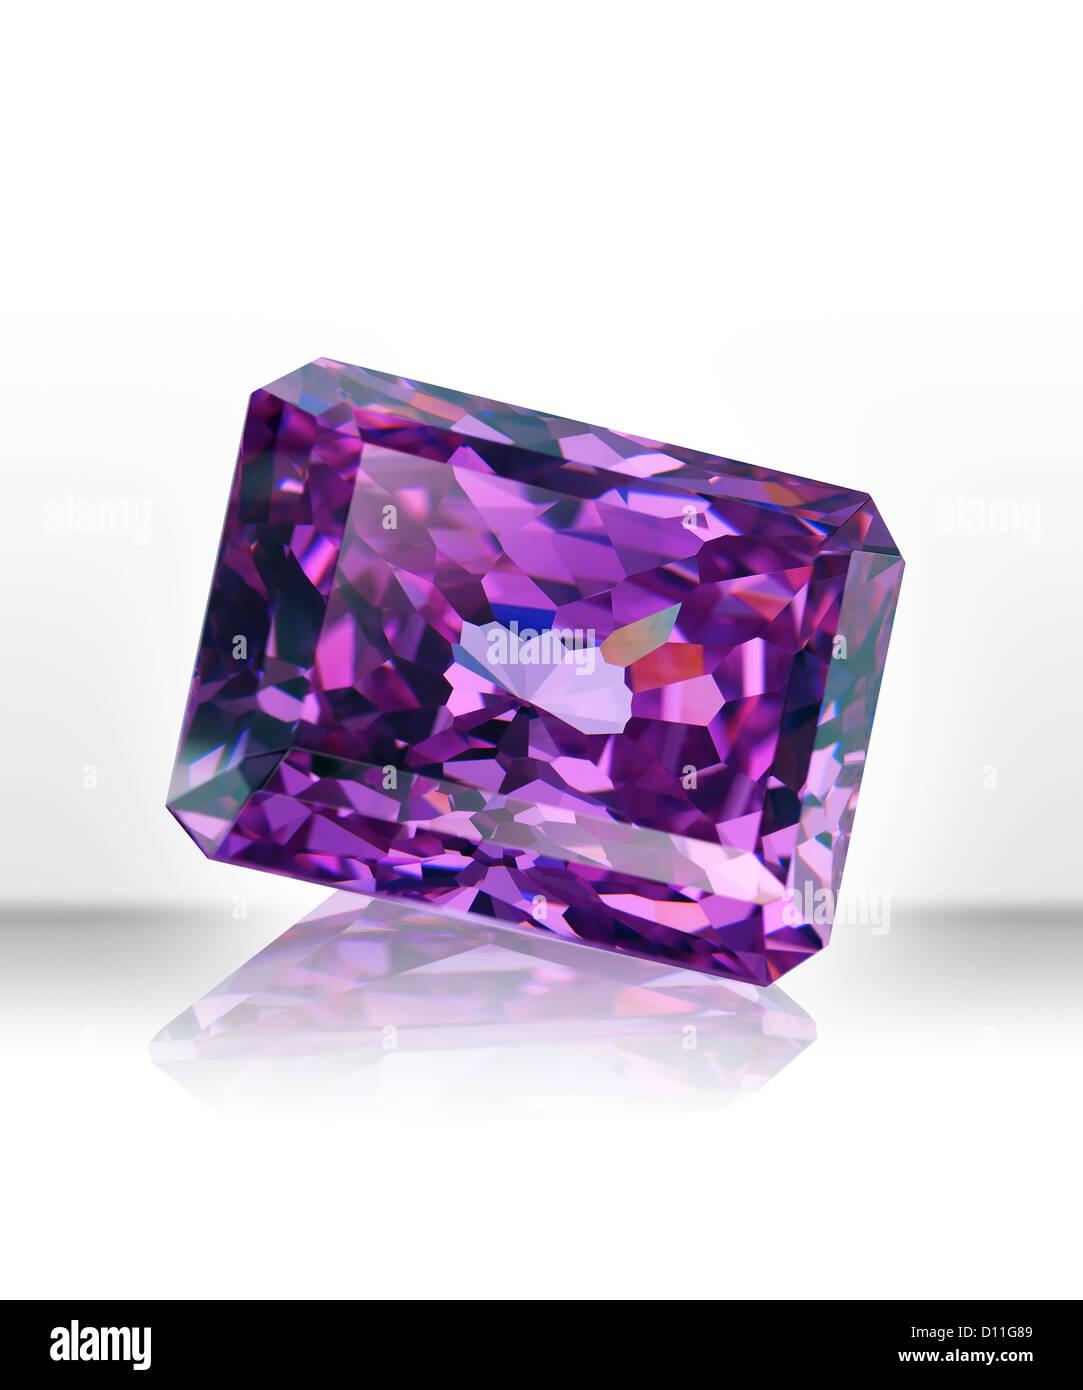 Purple rectangular gemstone - Stock Image